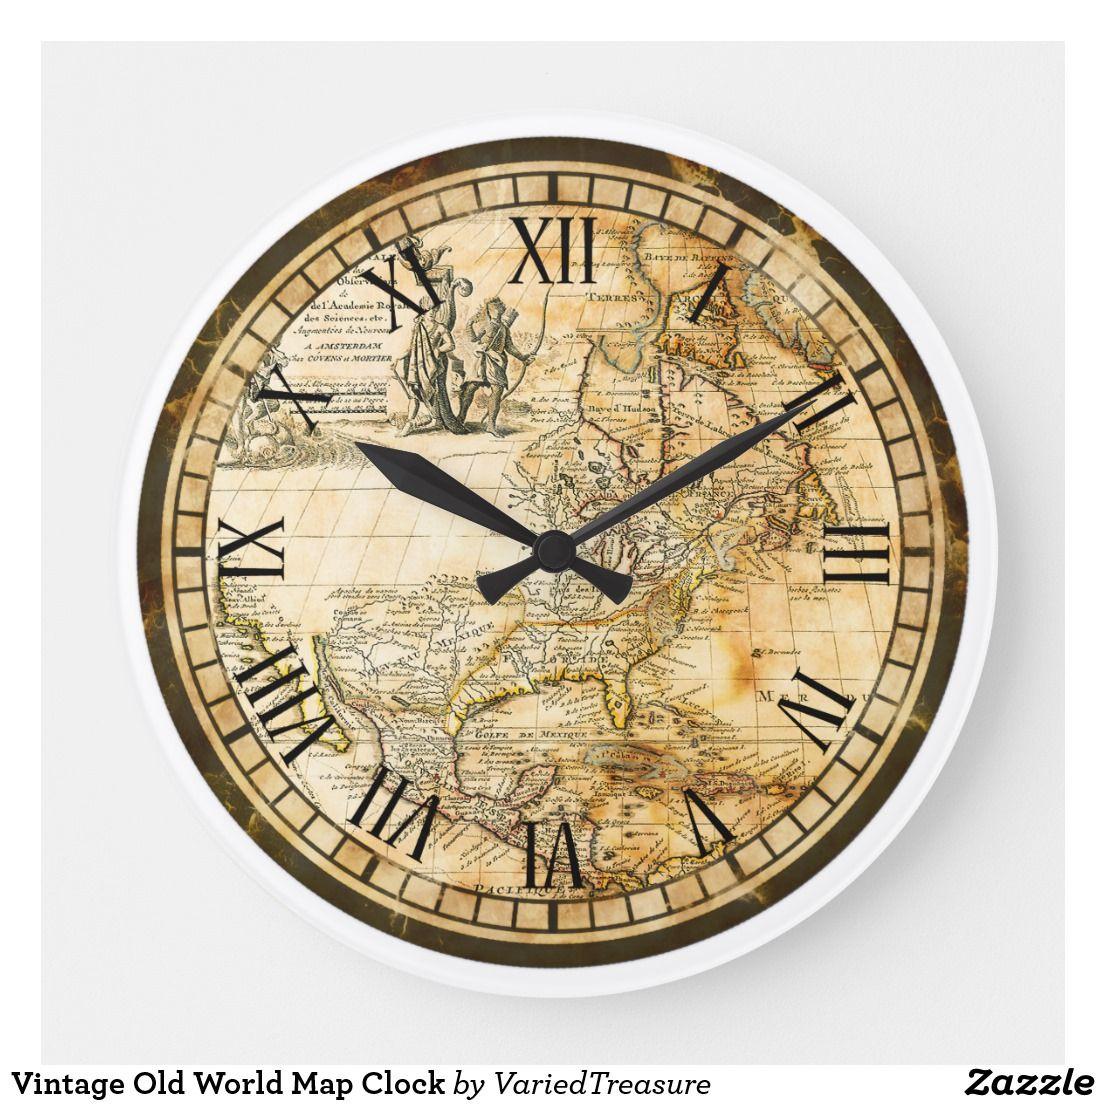 Vintage Old World Map Clock Zazzle Com Old World Maps Old World Clock